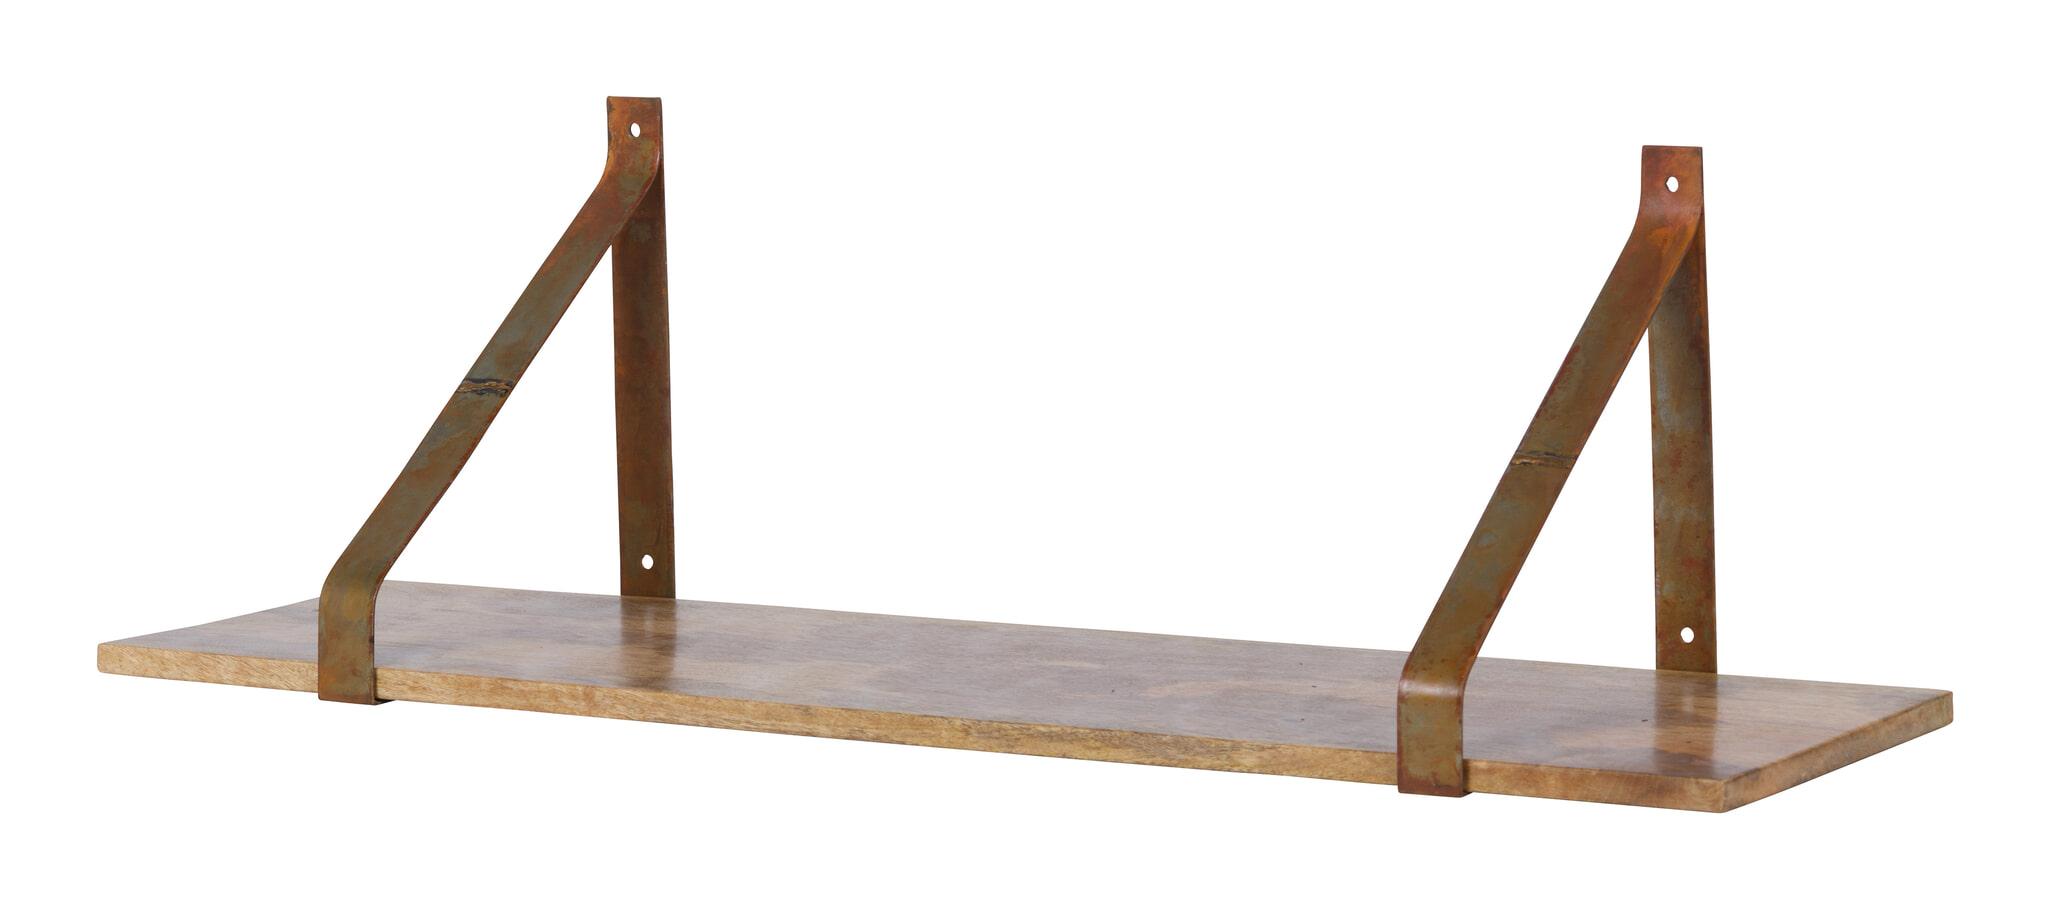 Wandplank 80 Cm.Bepurehome Wandplank Welldone 80cm Kleur Roest 800744 R